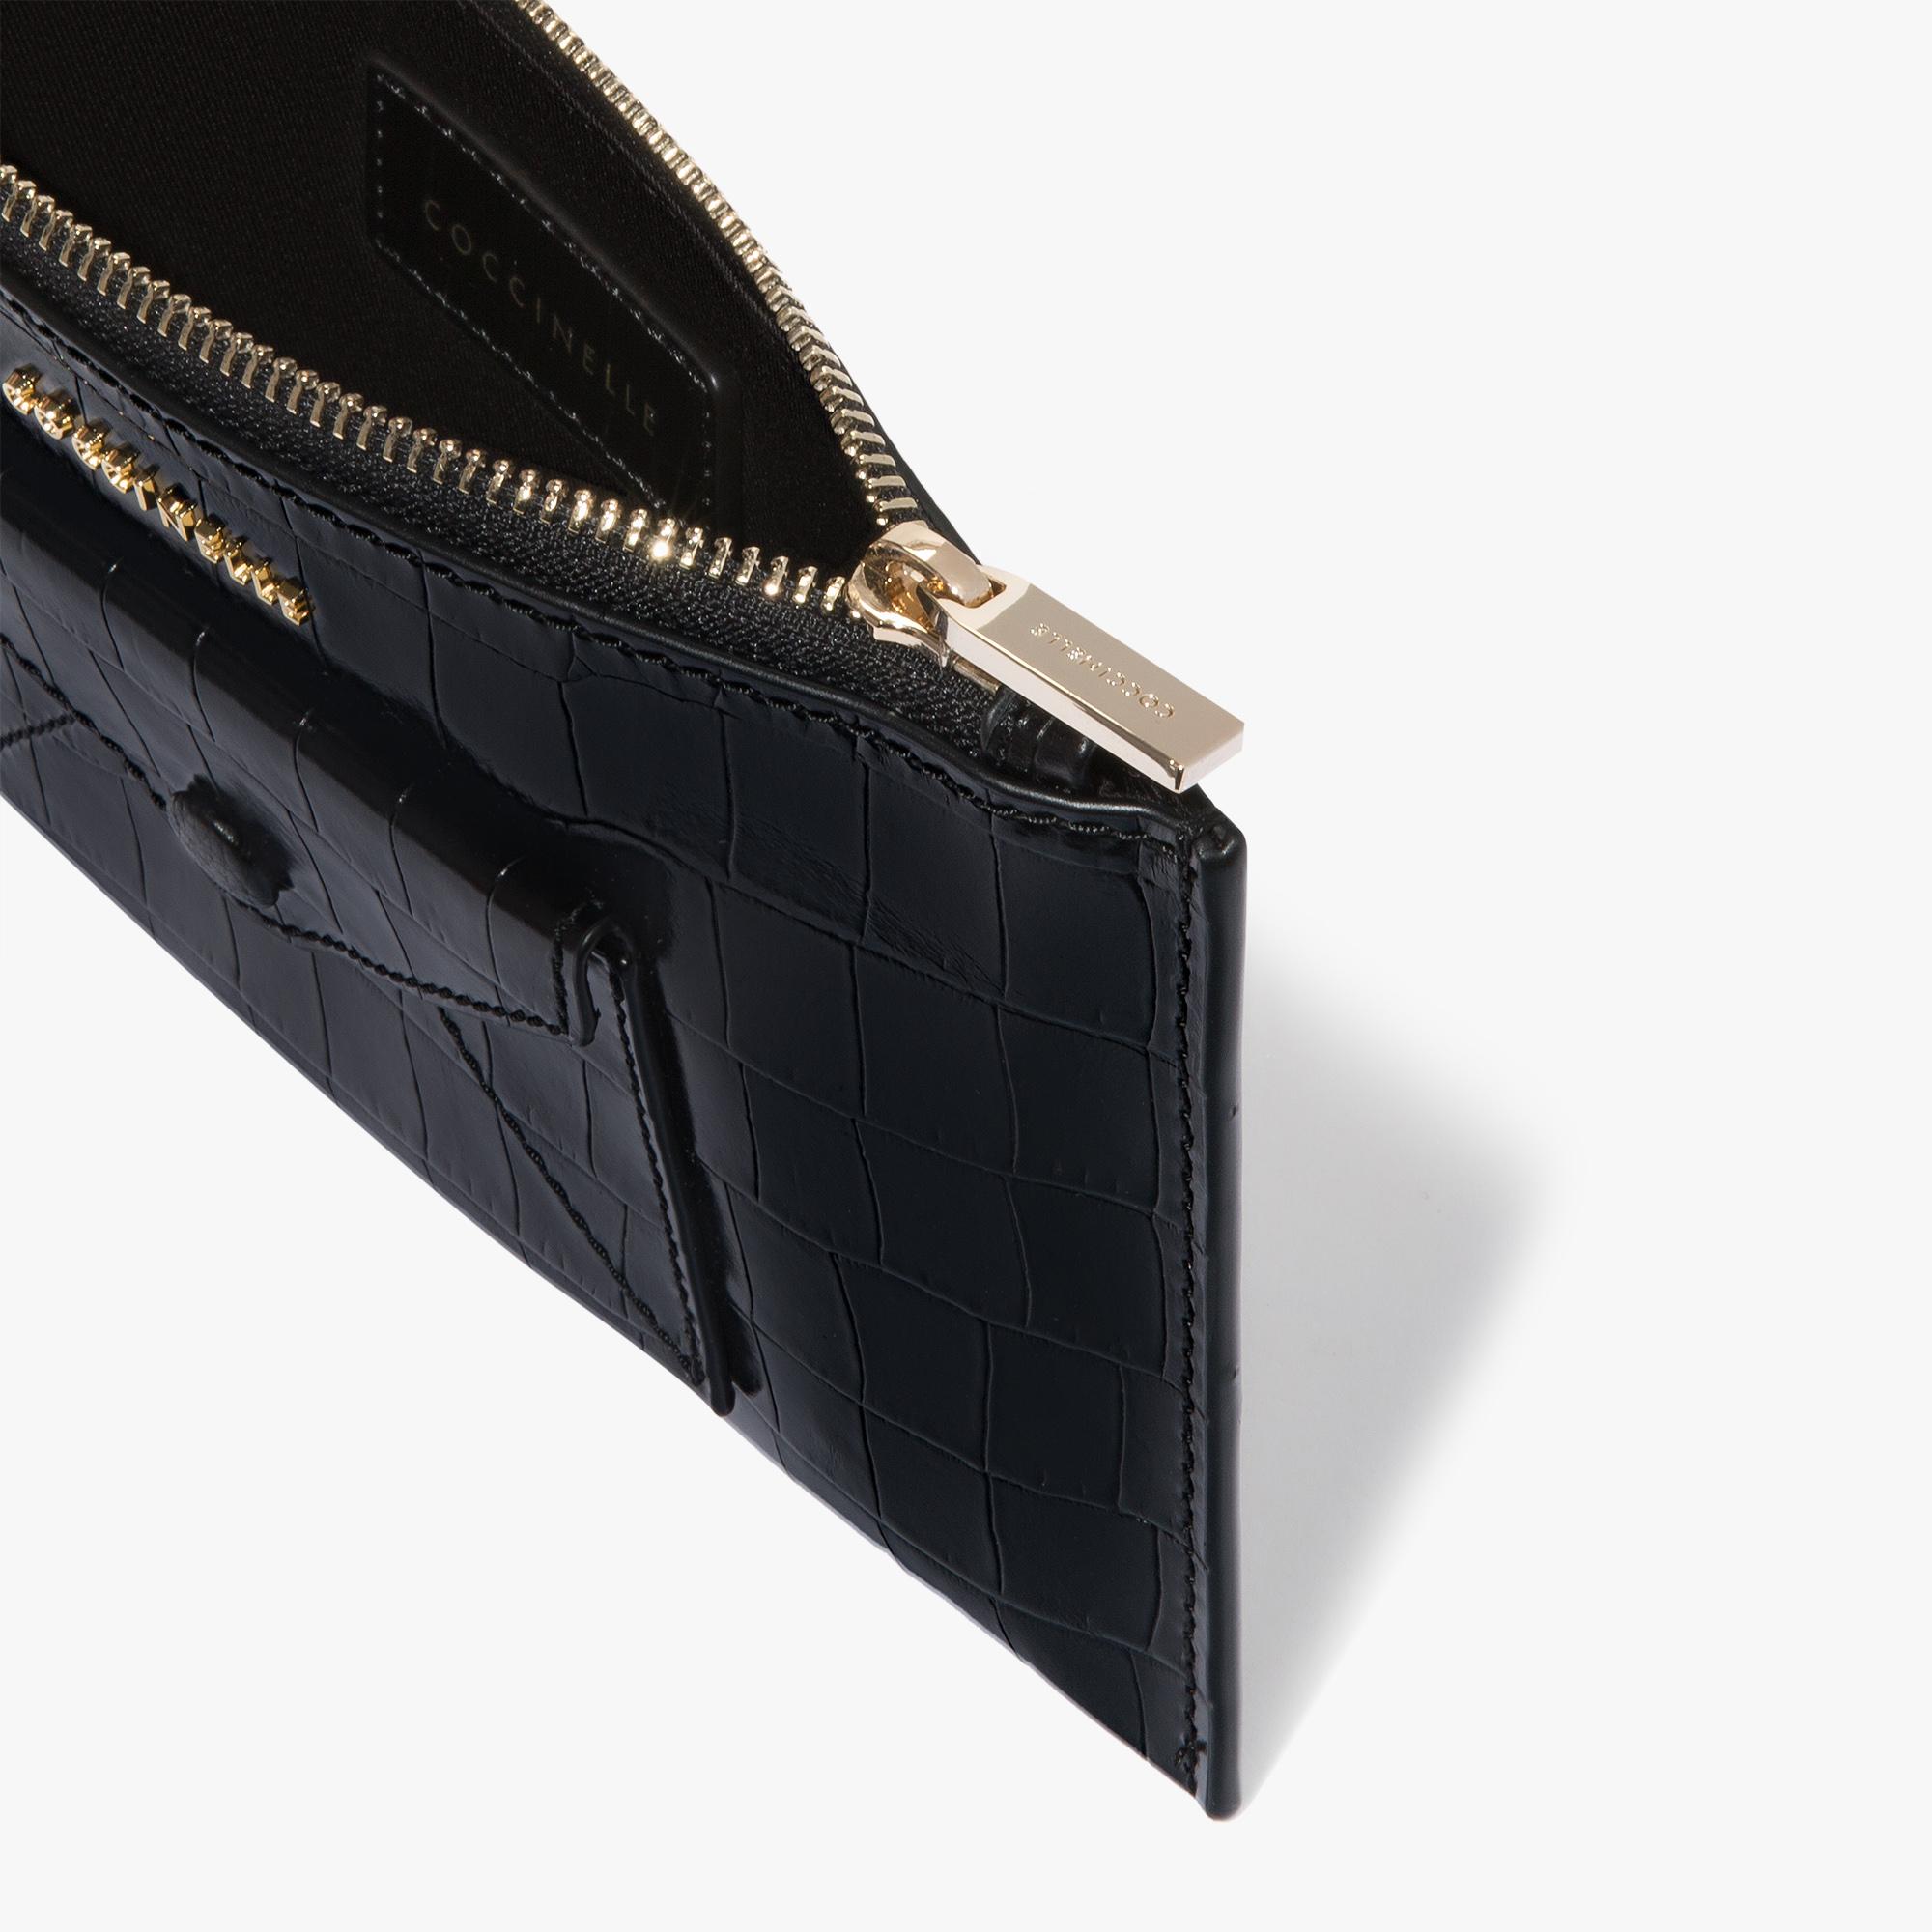 Crocodile-print leather clutch